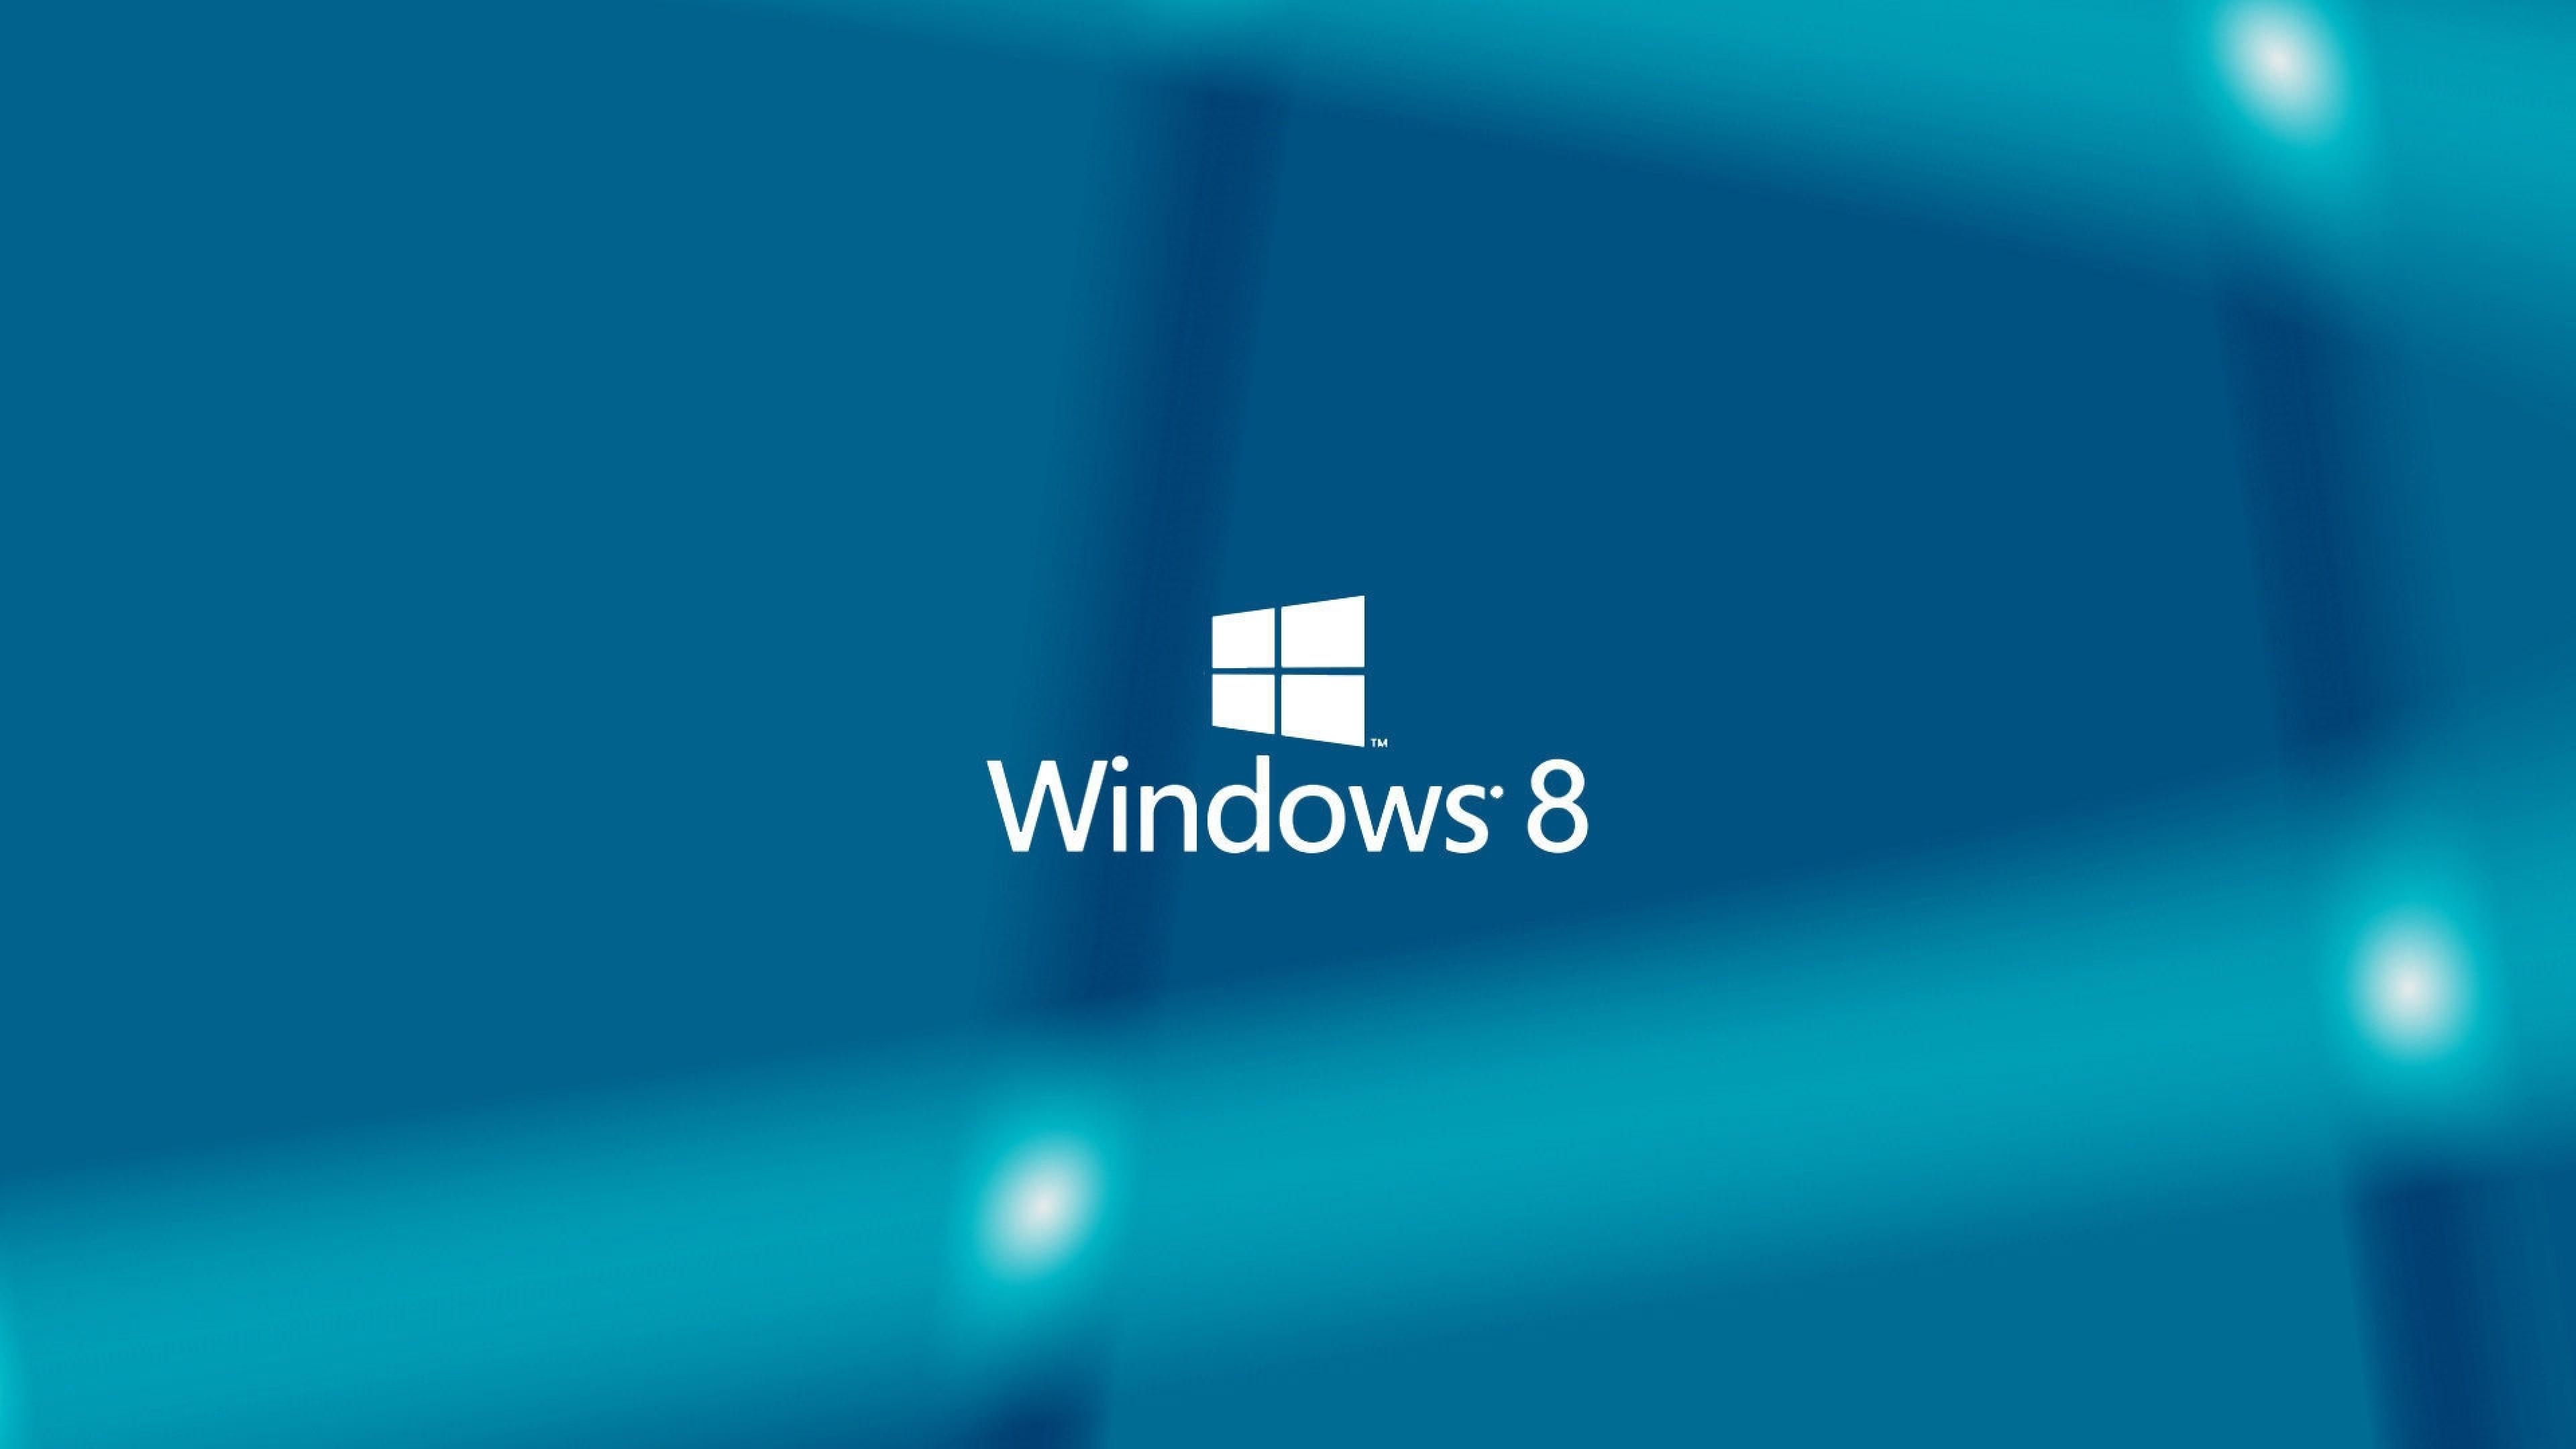 Wallpaper windows 8, operating system, design, logo